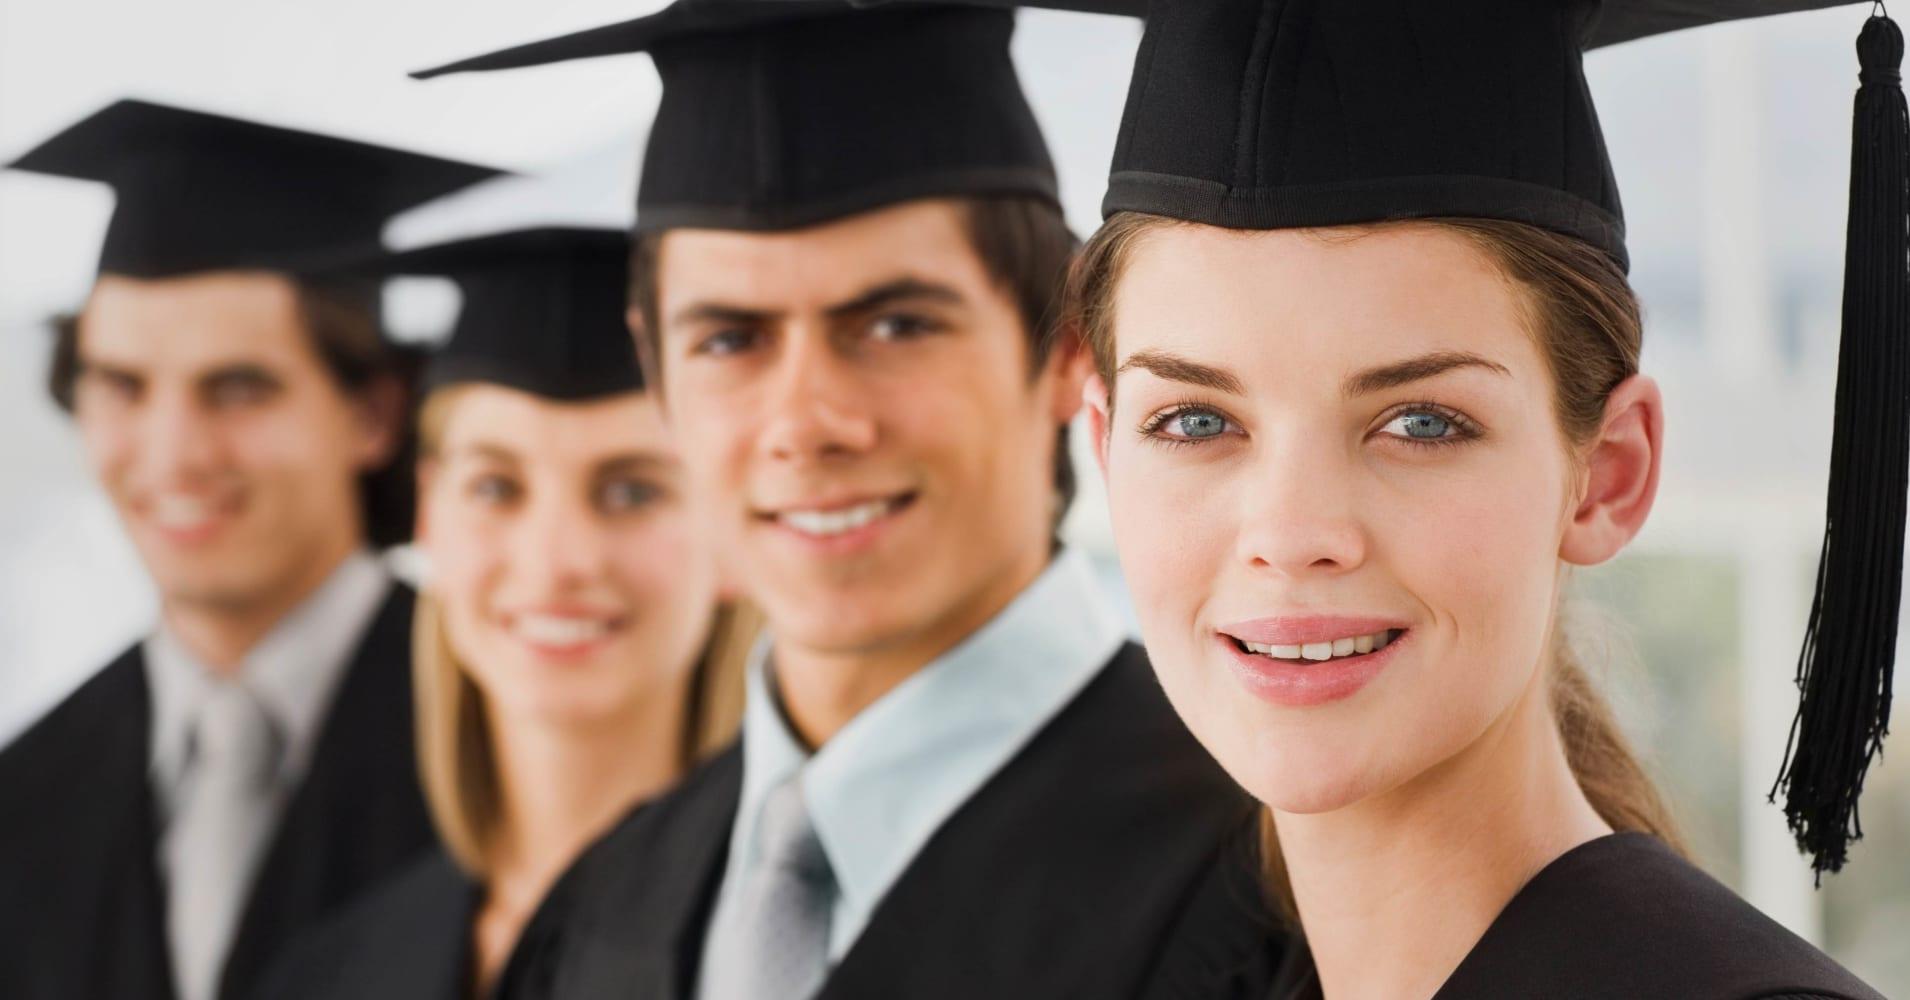 The High Price of High School Graduation